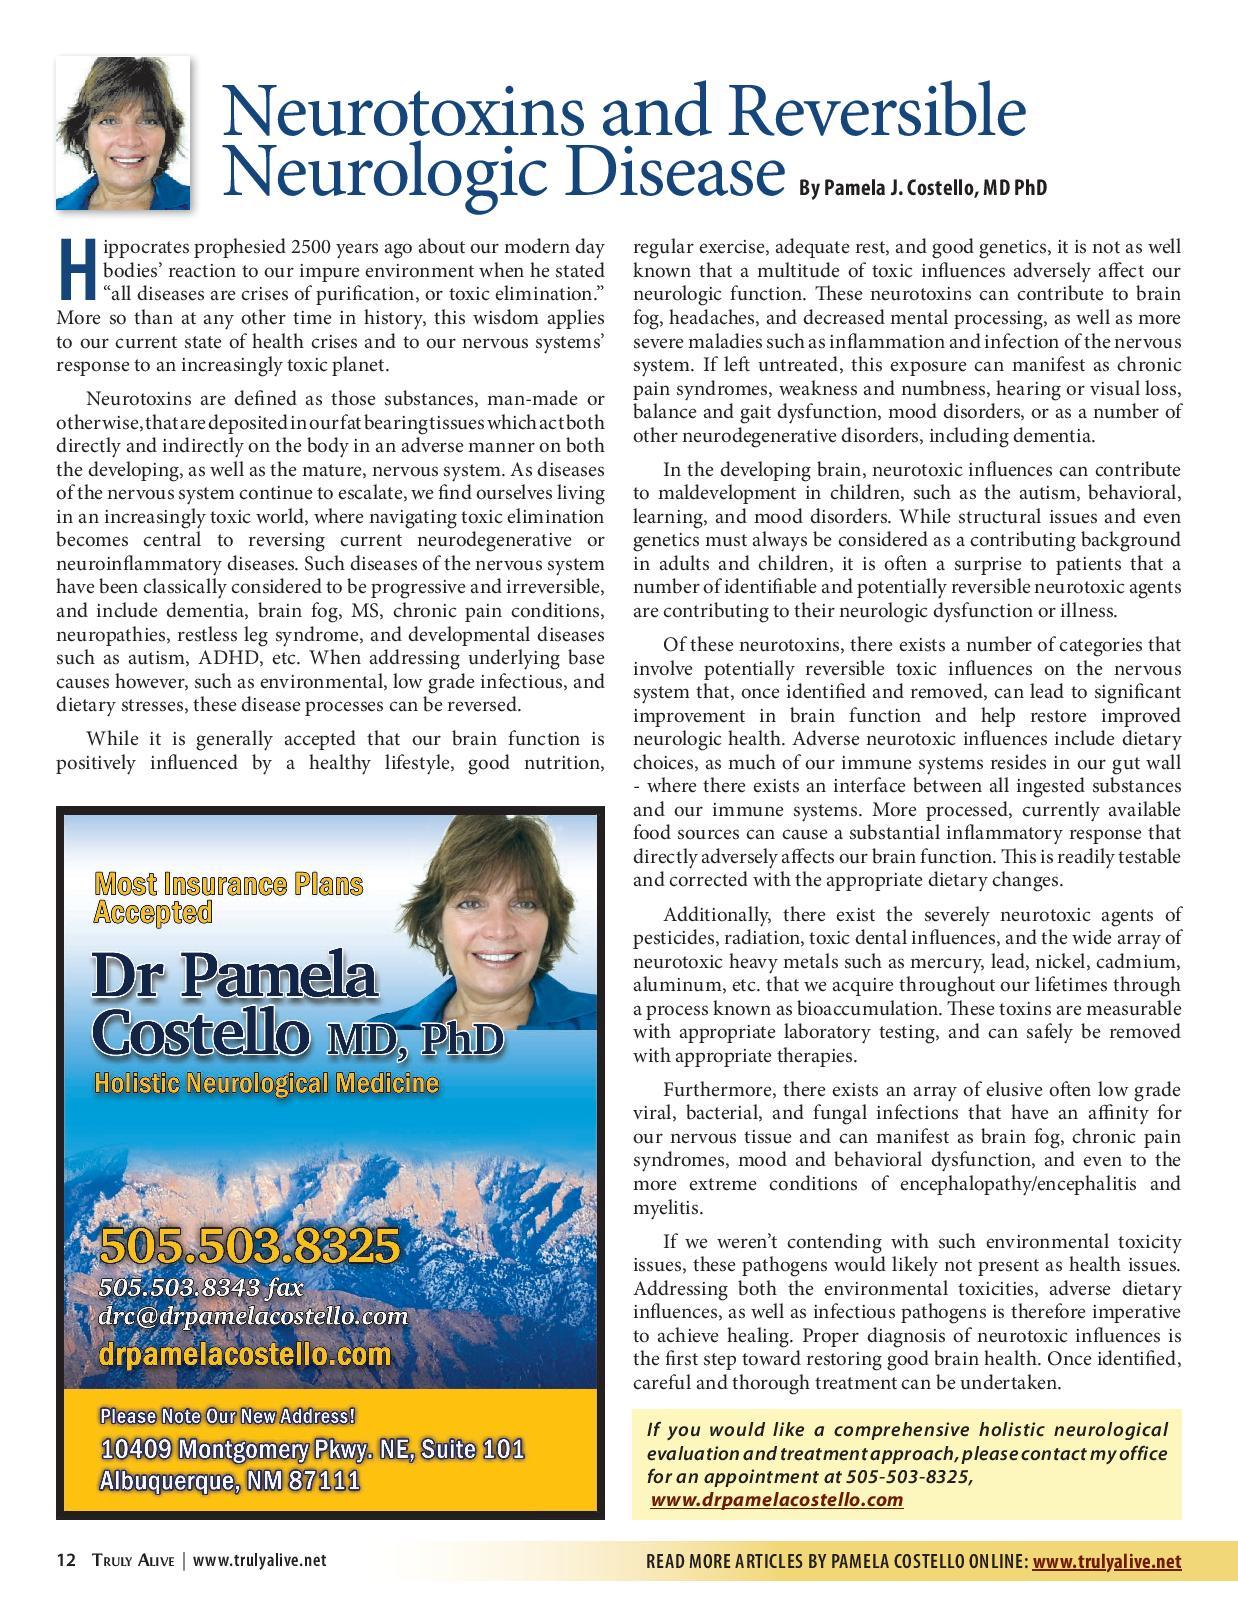 neurotoxins and reversable neurologic diseases-page-001